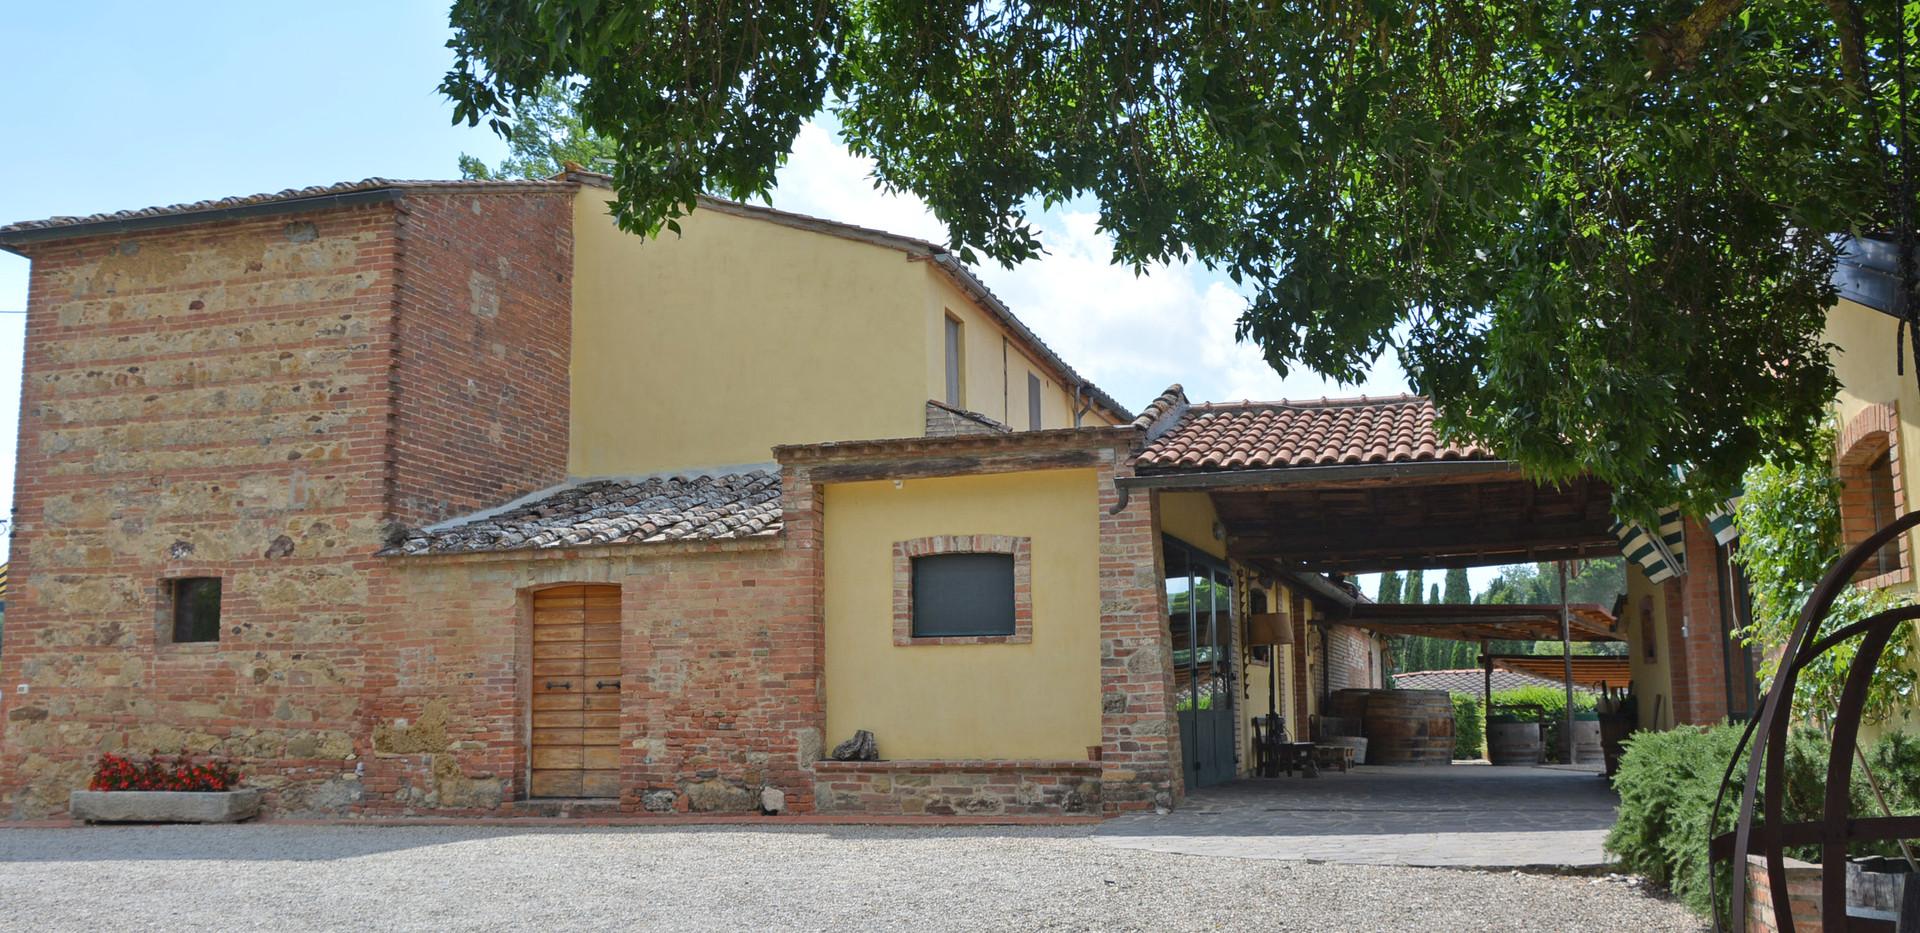 Montepulciano winery